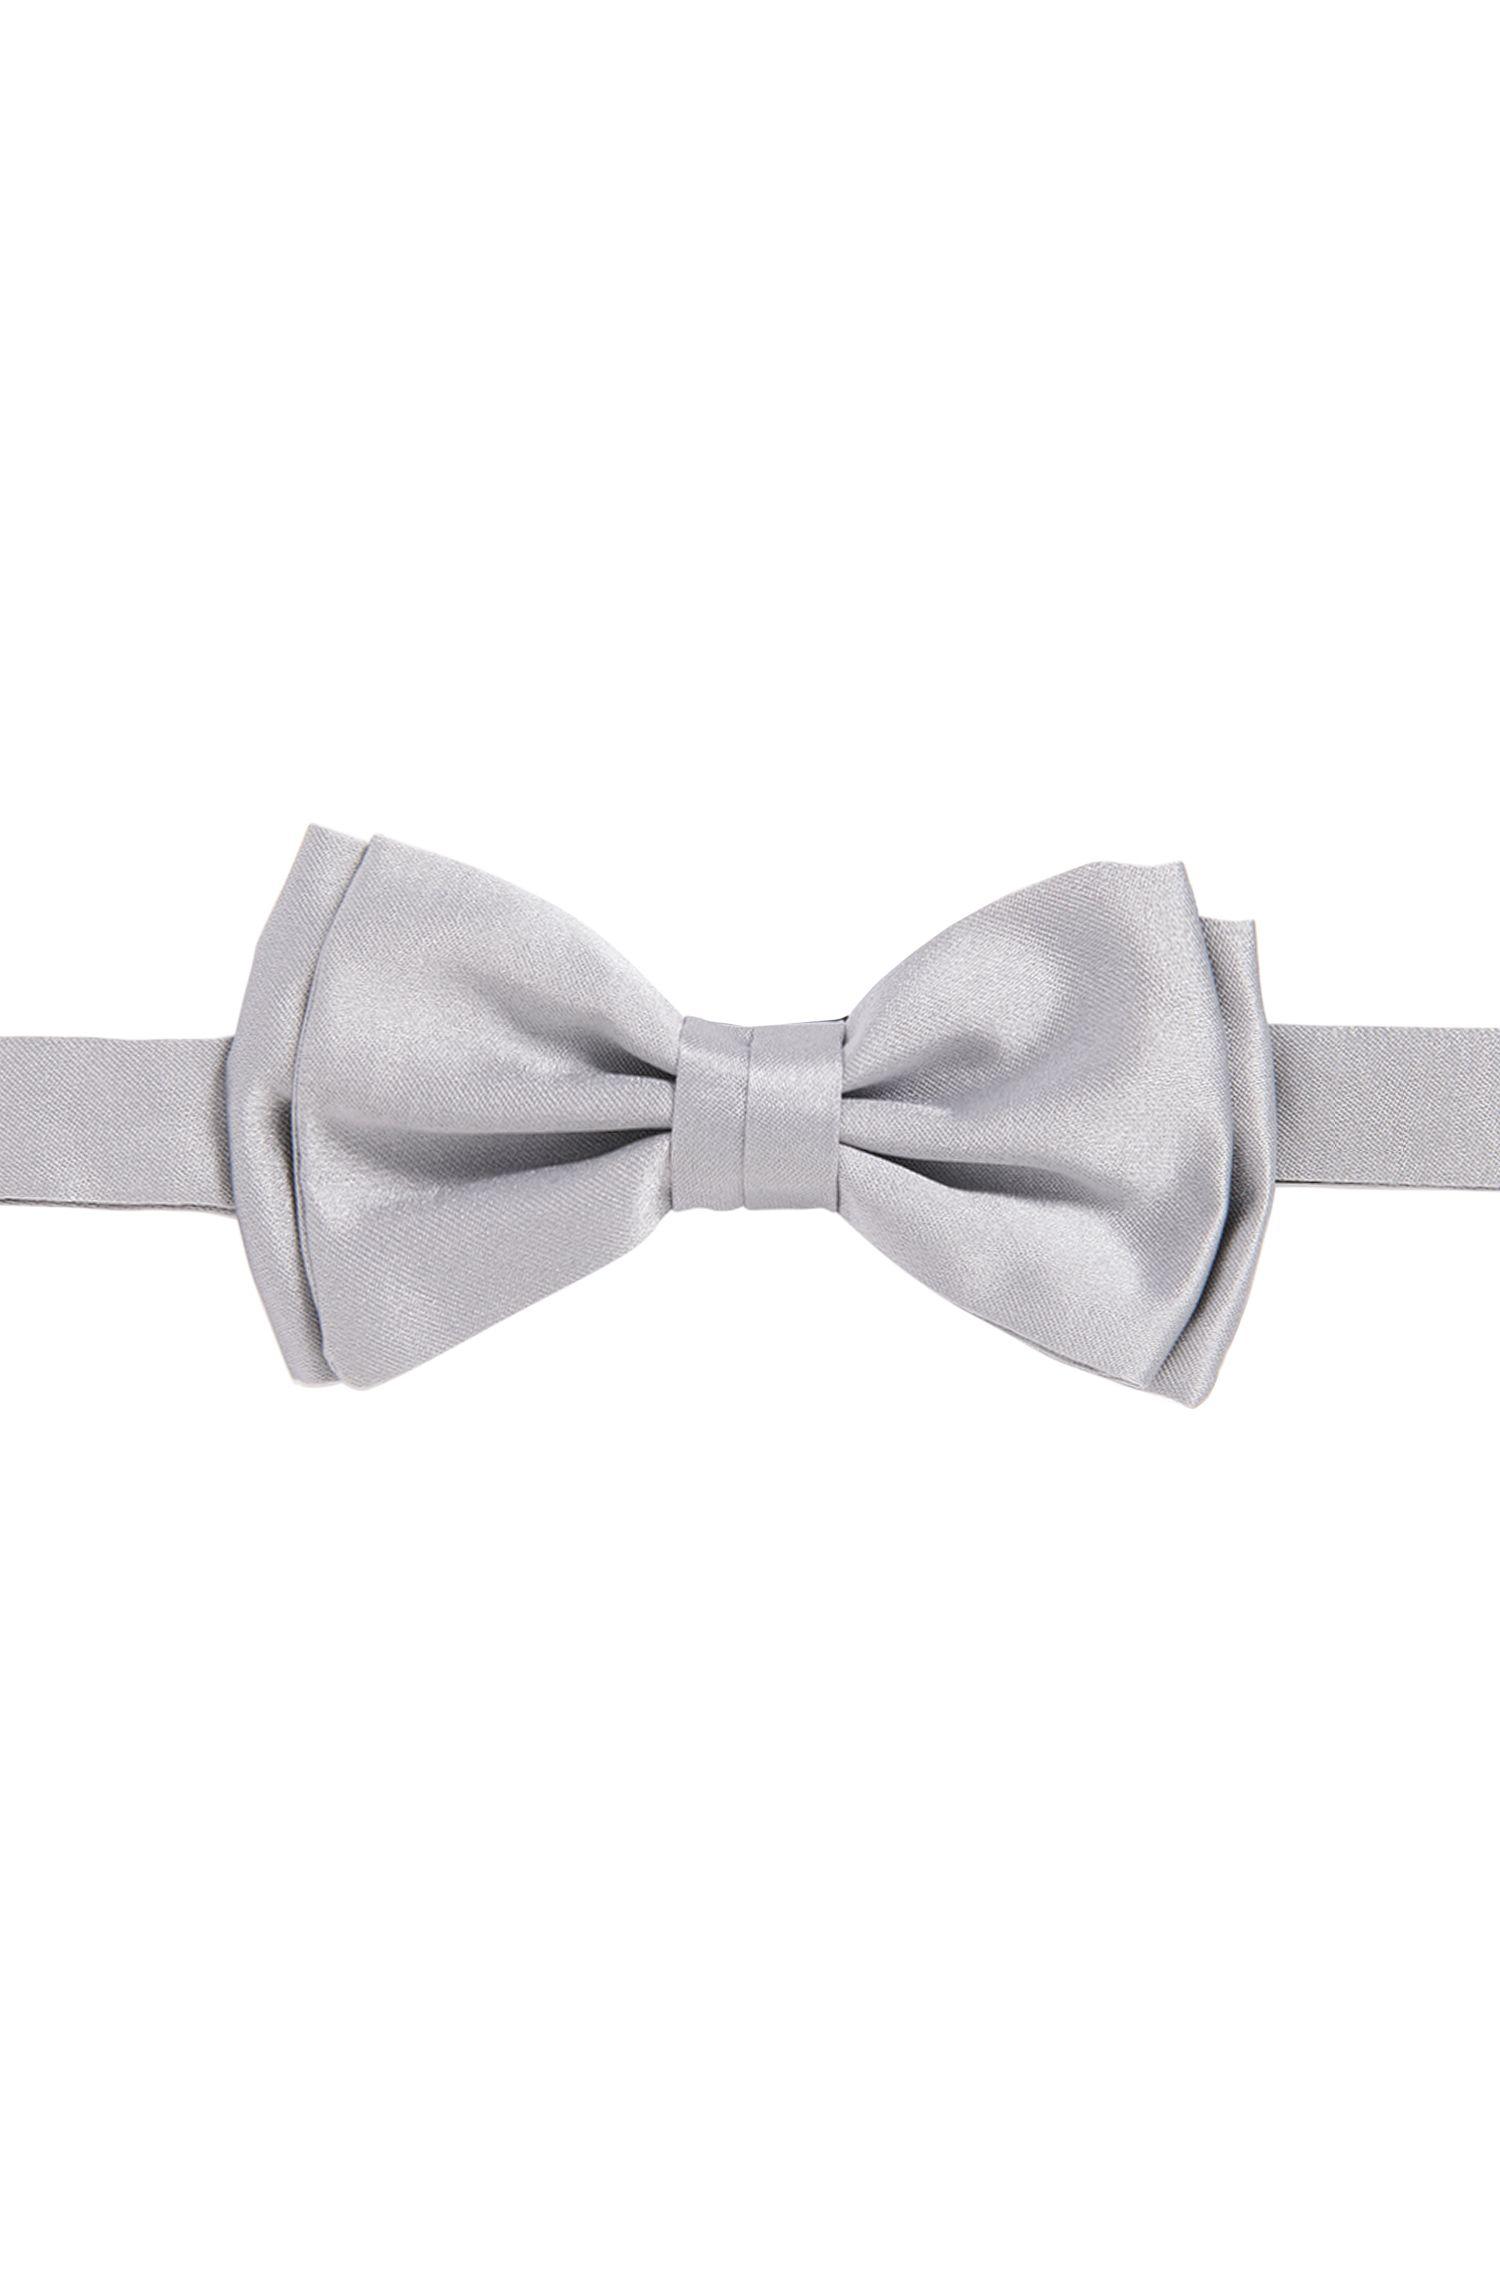 Butterfly bow tie in jacquard silk